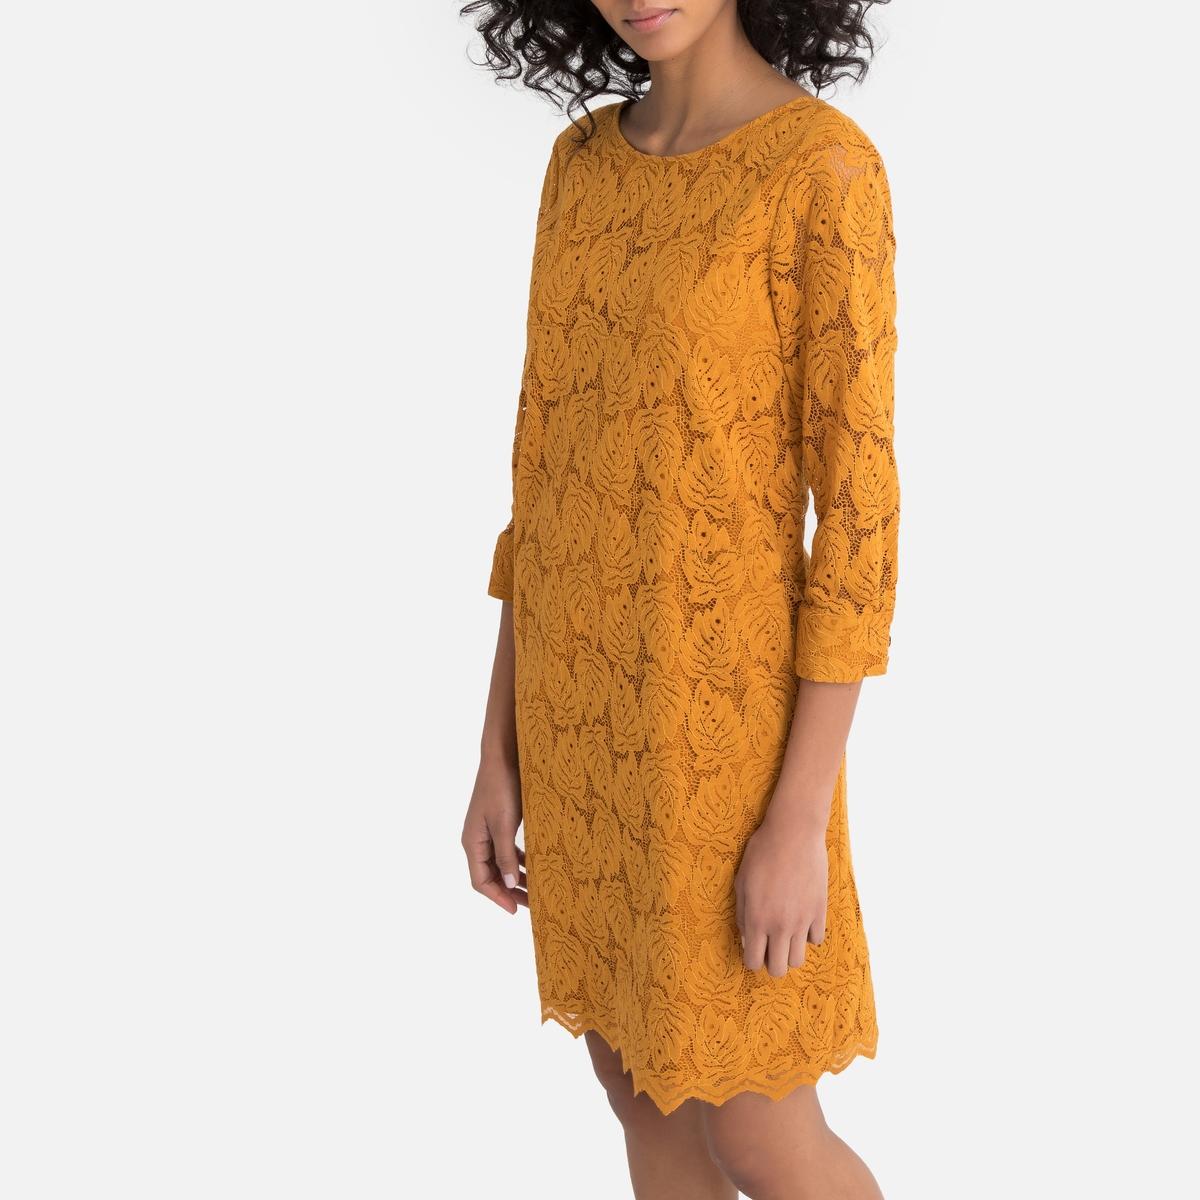 Платье La Redoute Короткое из гипюра с рукавами 36 (FR) - 42 (RUS) оранжевый короткое платье из гипюра american apparel